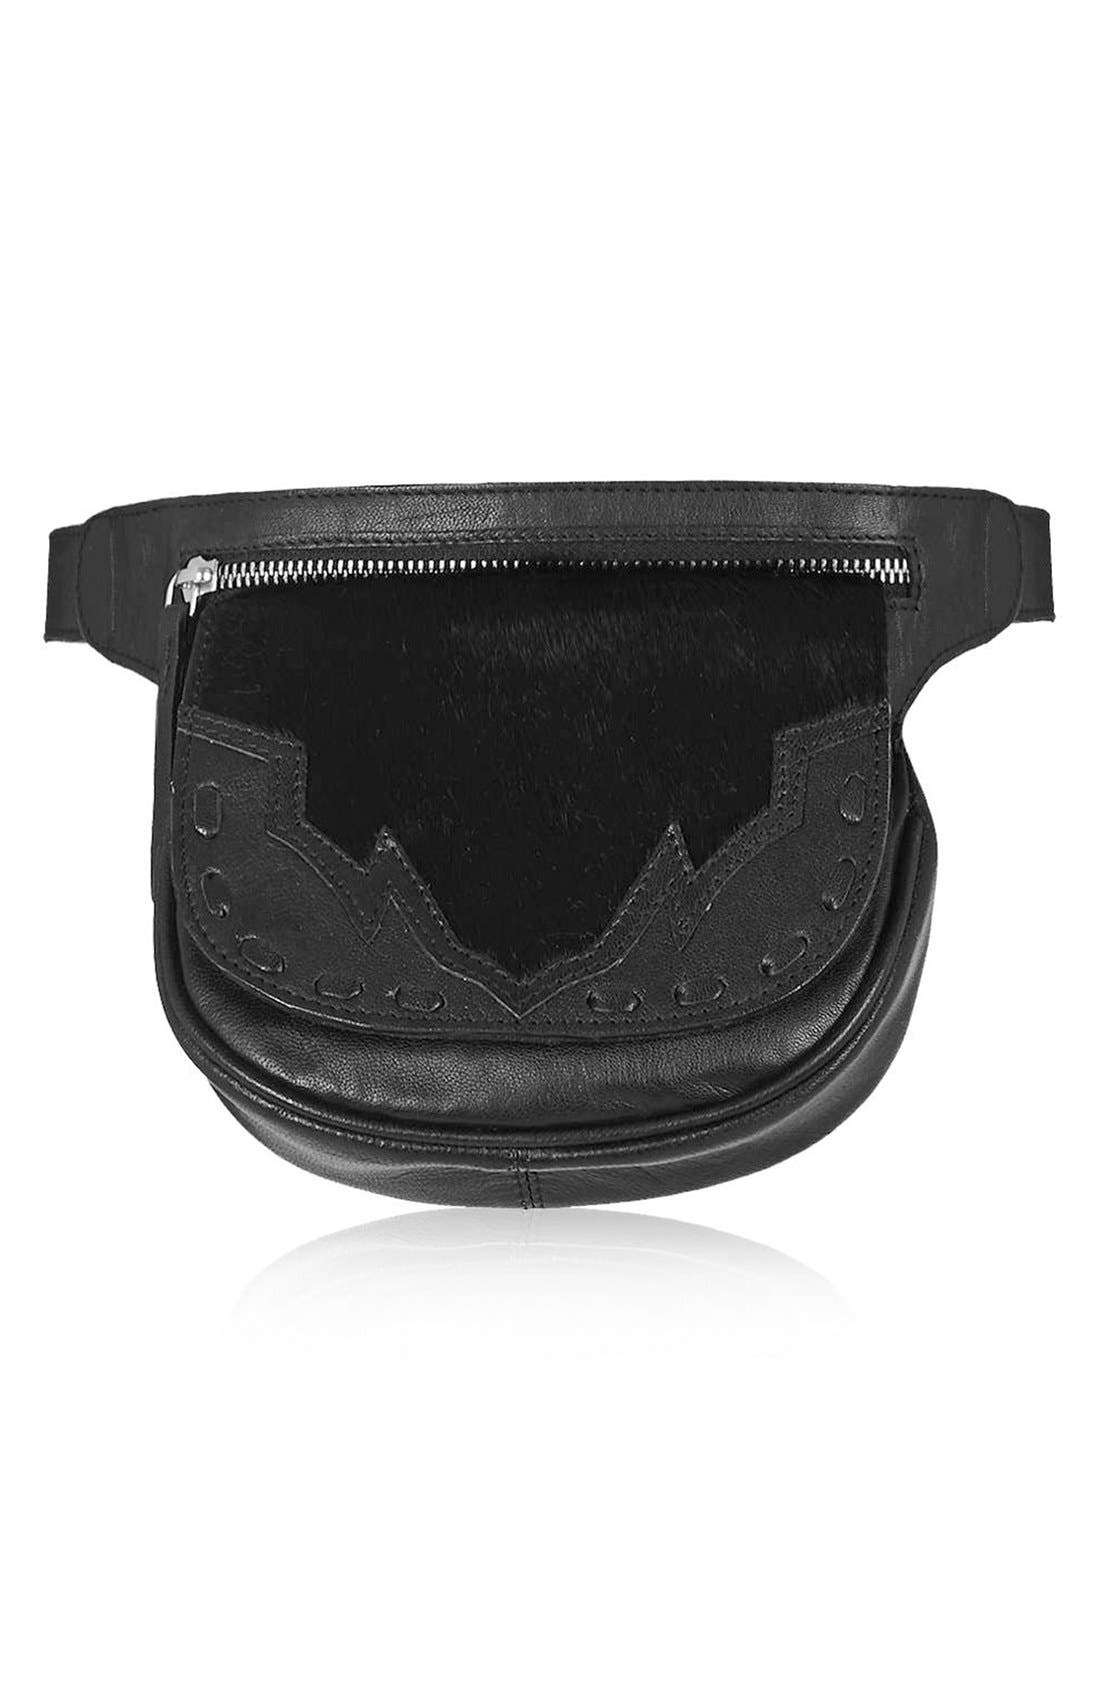 Alternate Image 1 Selected - Topshop Western Leather & Calf Hair Belt Bag